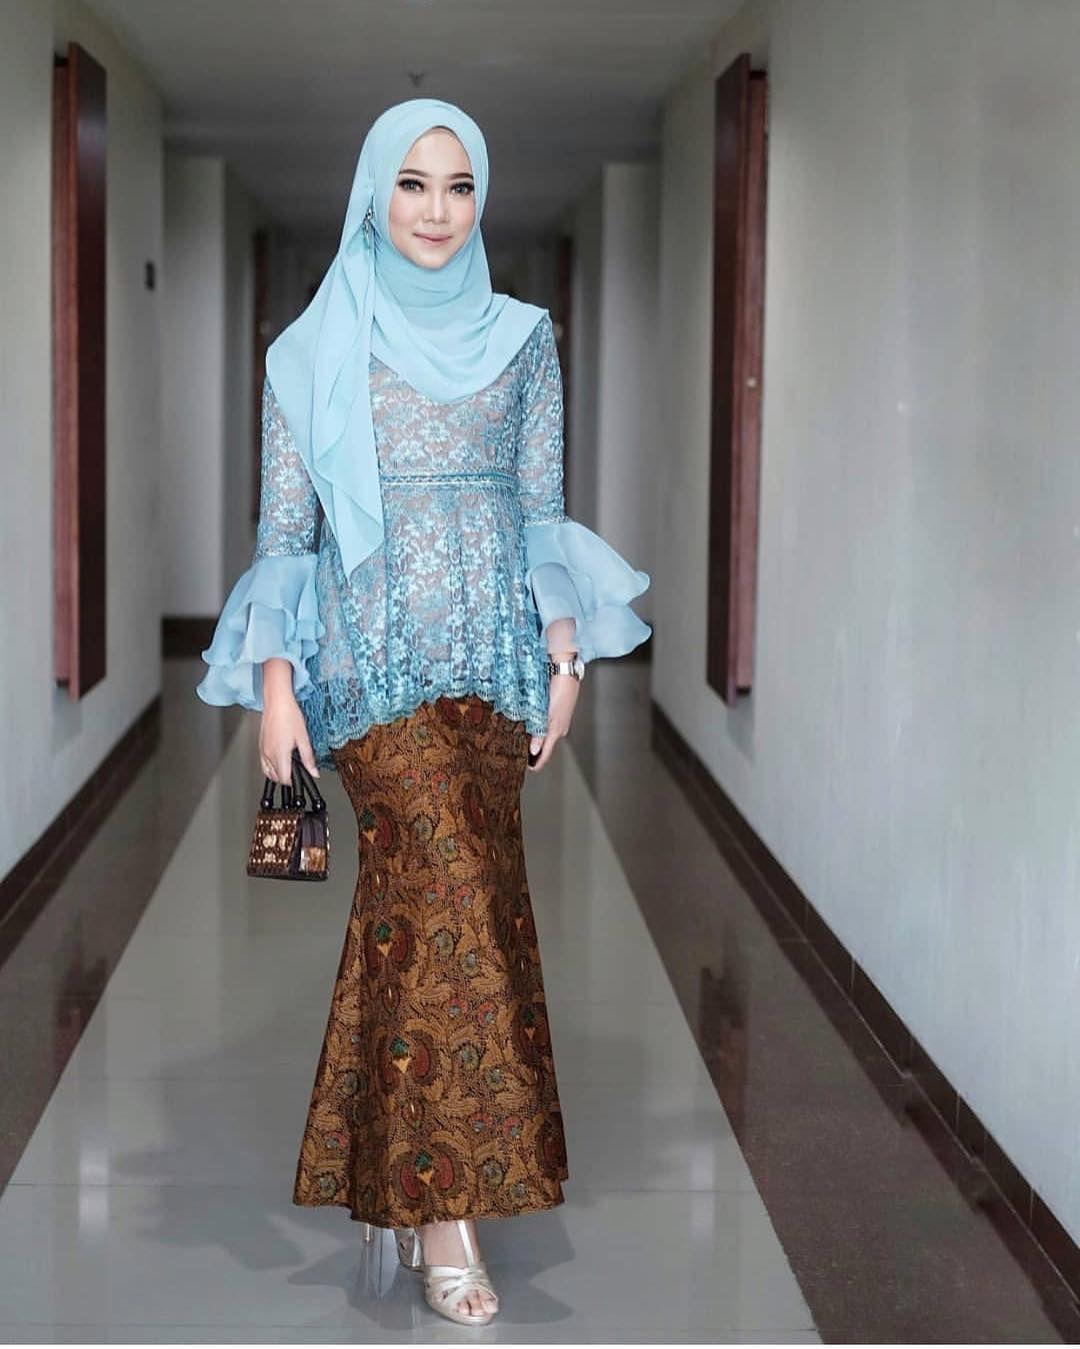 Kebaya inspiration from @siskahelen  Model kebaya, Batik fashion